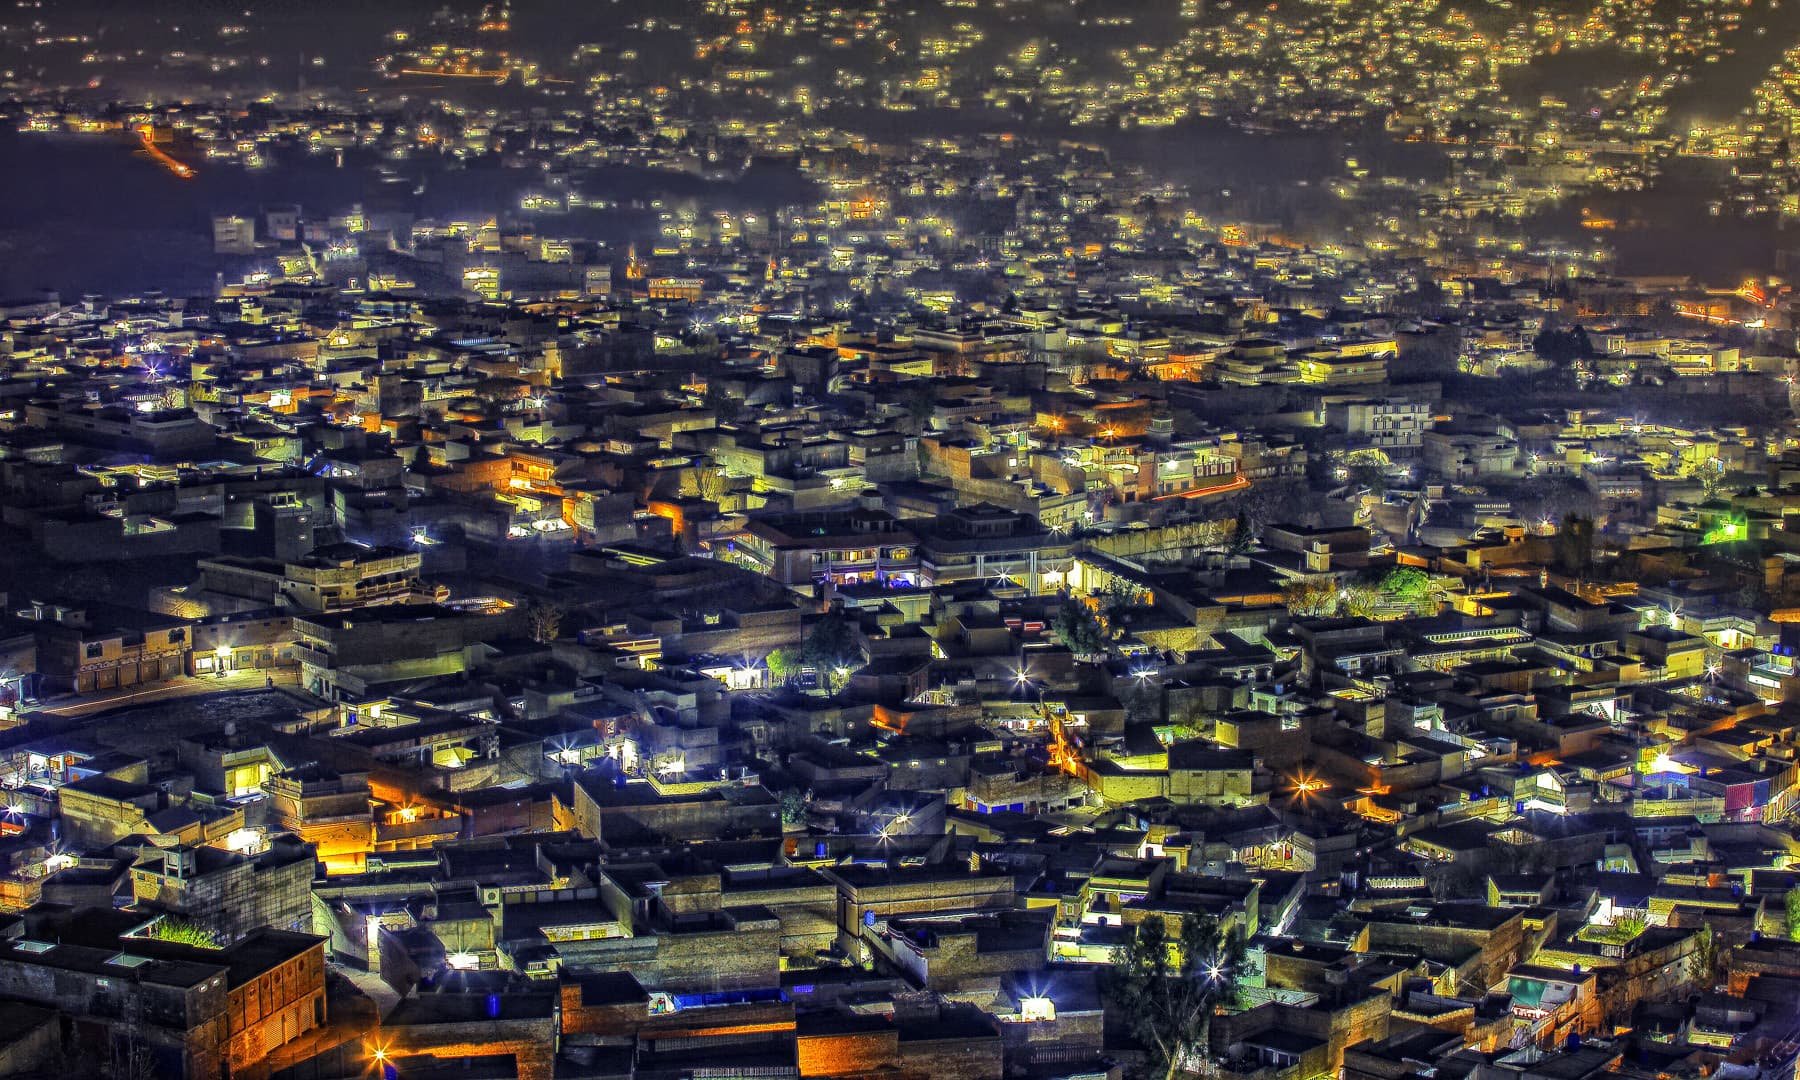 مینگورہ شہر پر رات کا منظر. — فوٹو سید مہدی بخاری۔